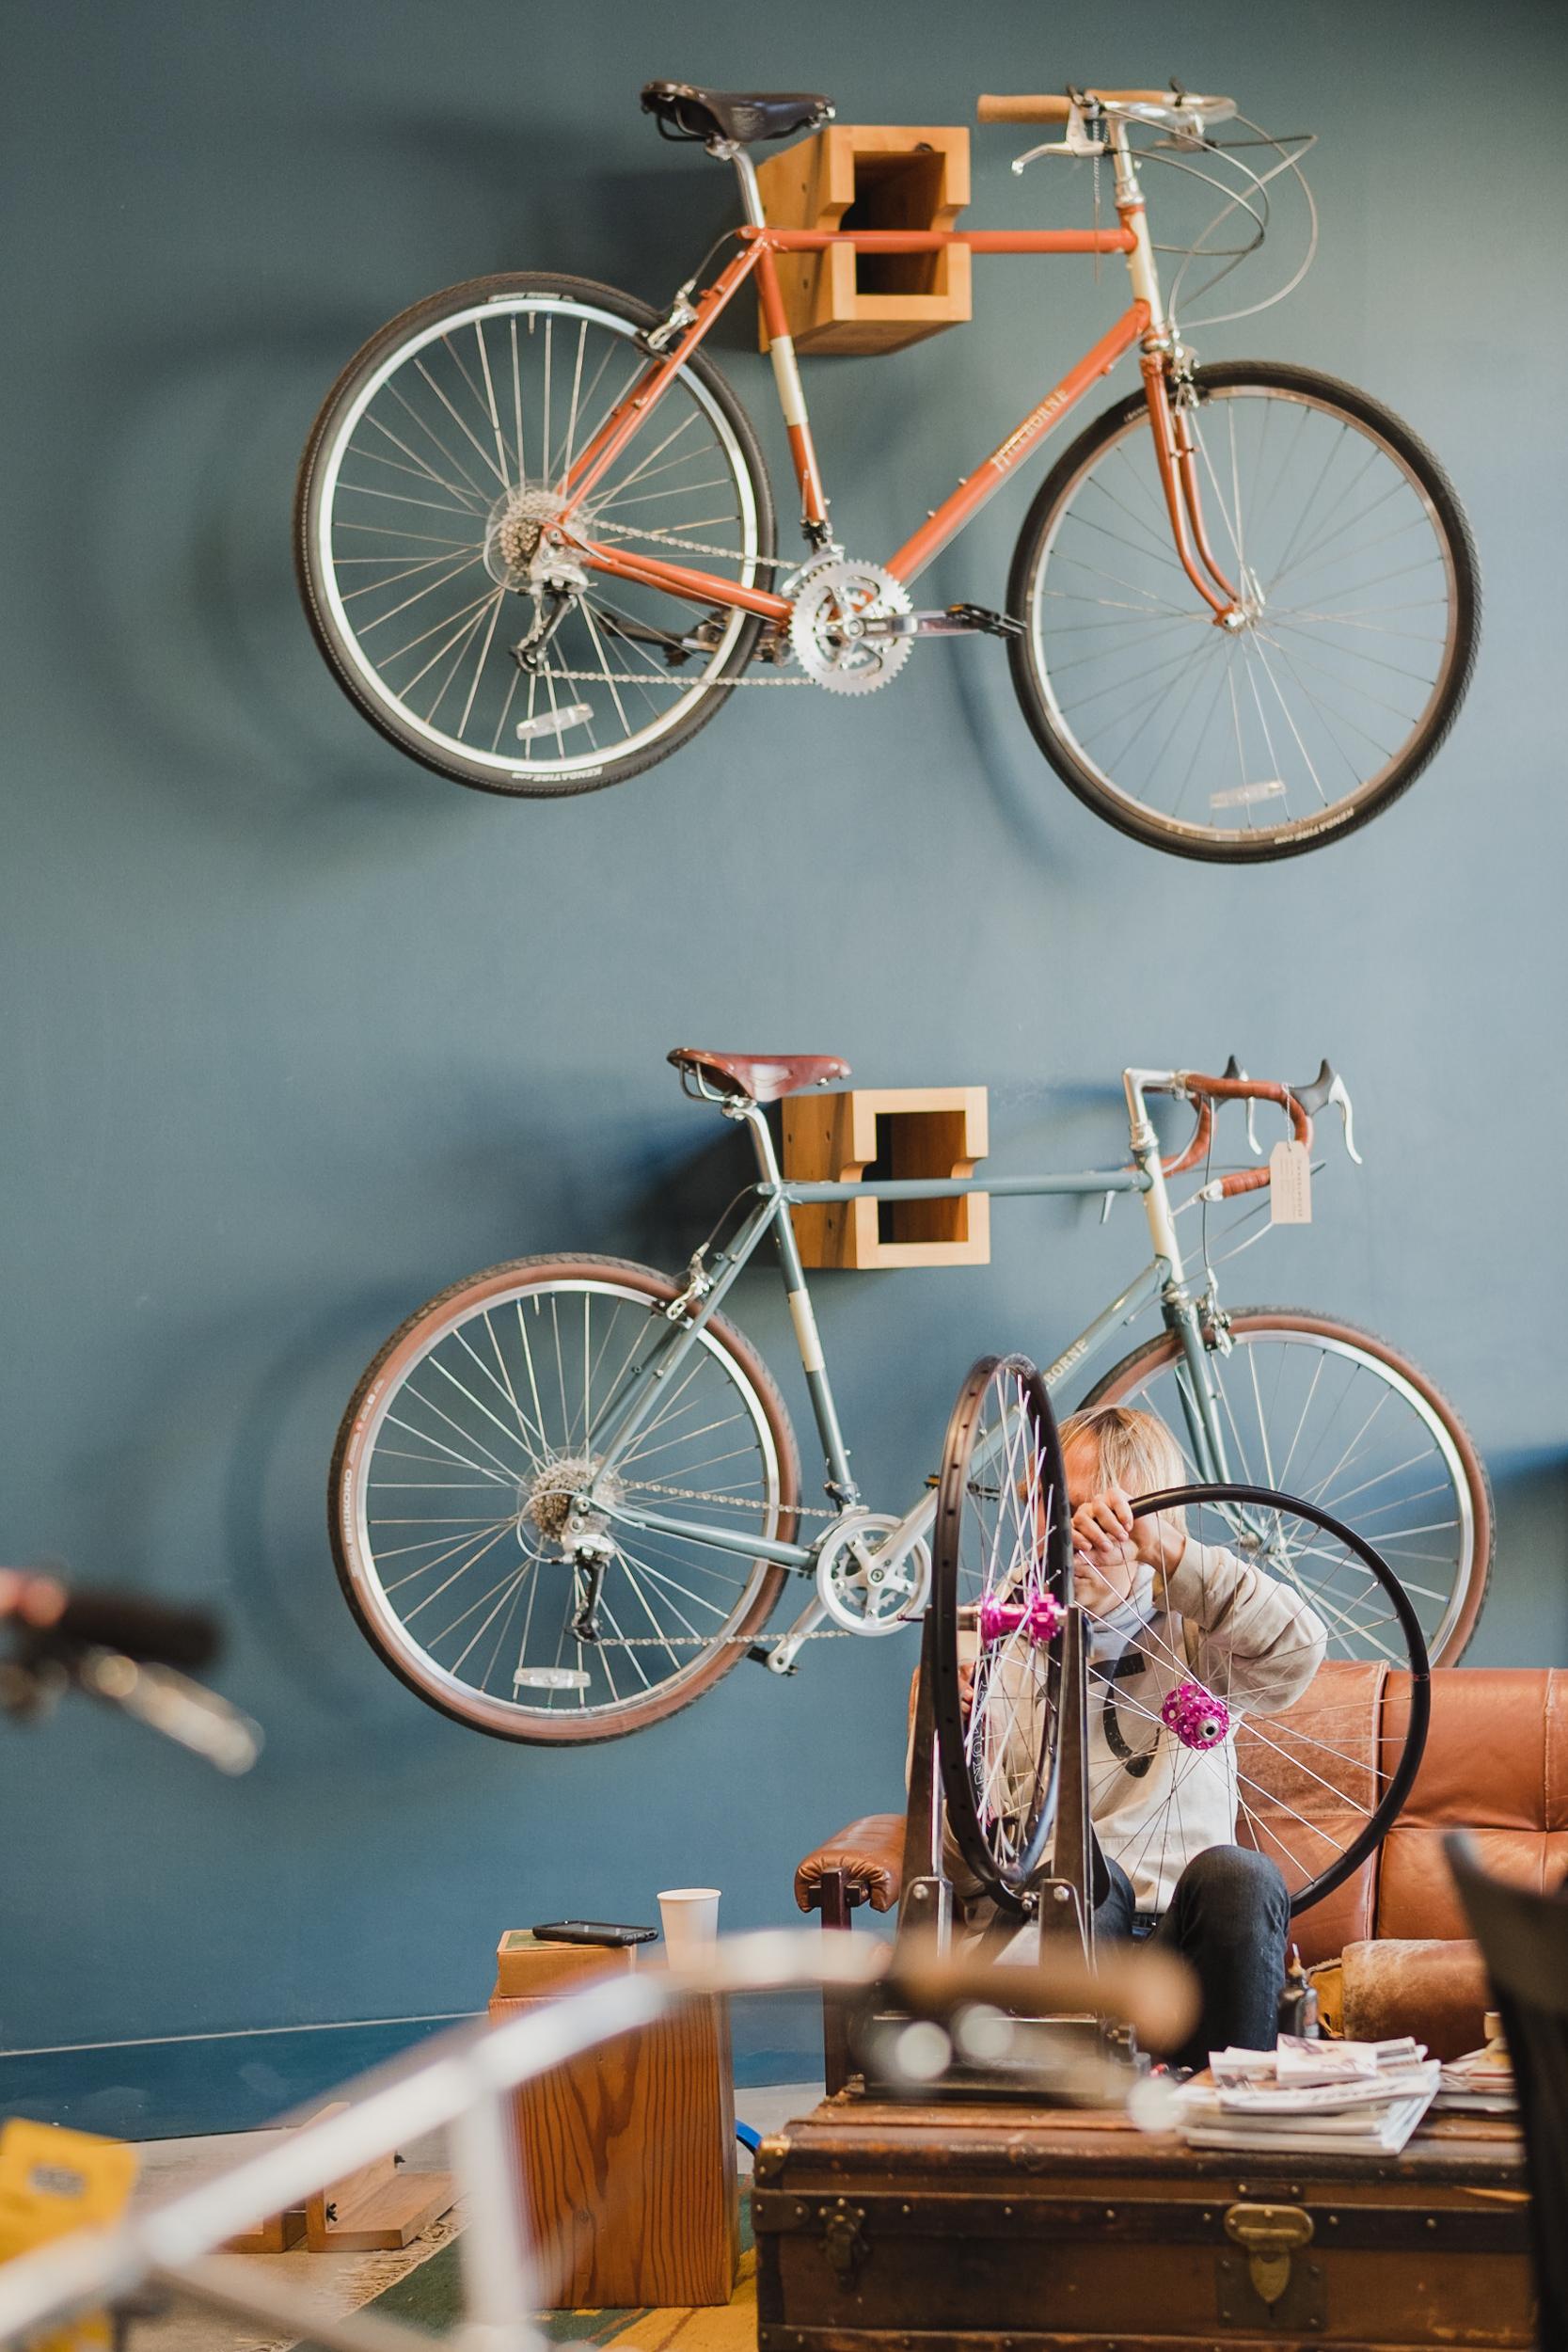 bike-cafe-LA-7925.jpg